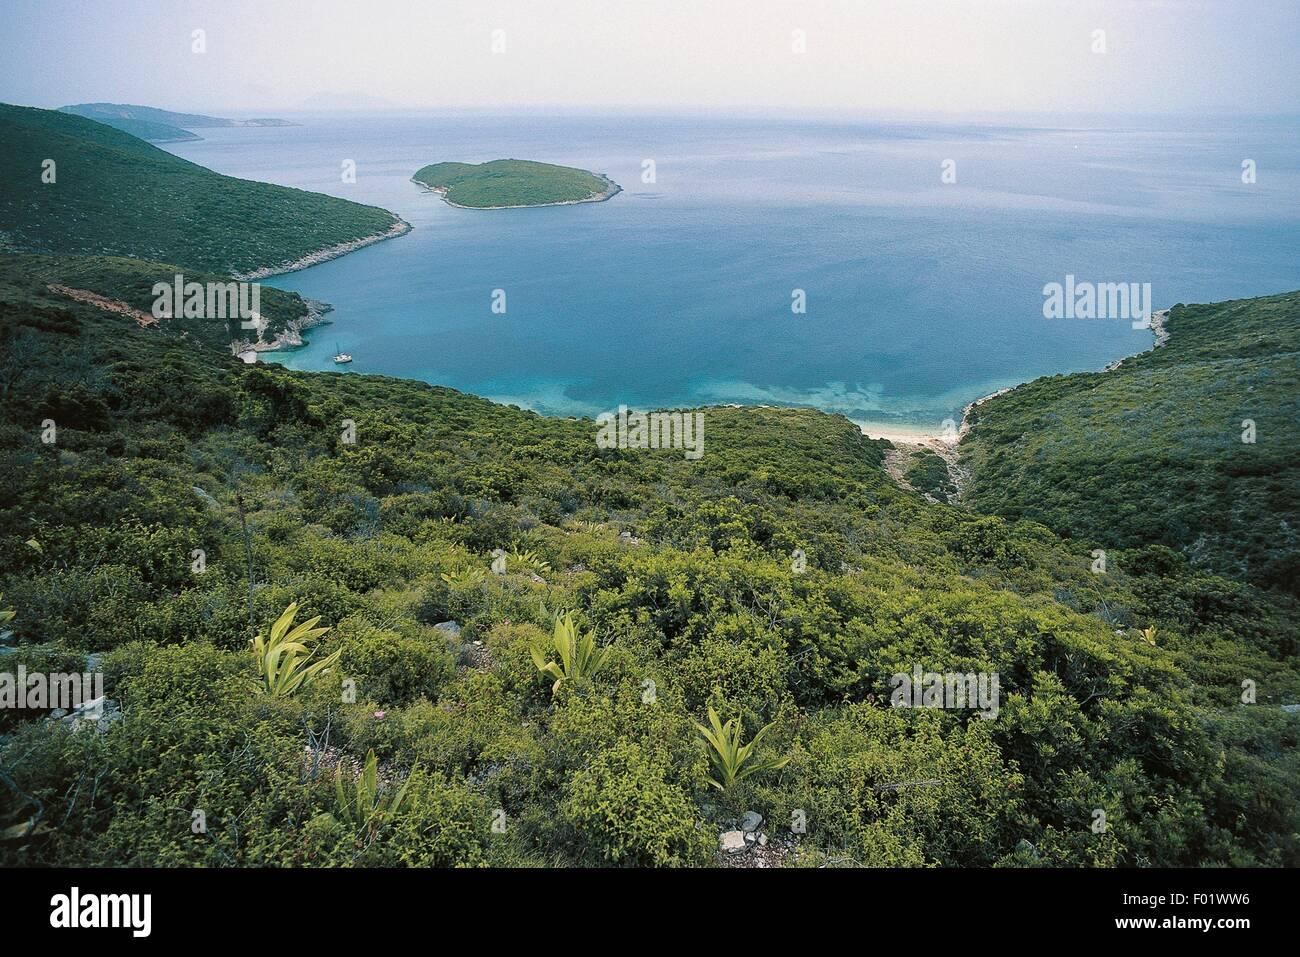 The coast of Ithaca, Ionian islands, Greece. - Stock Image